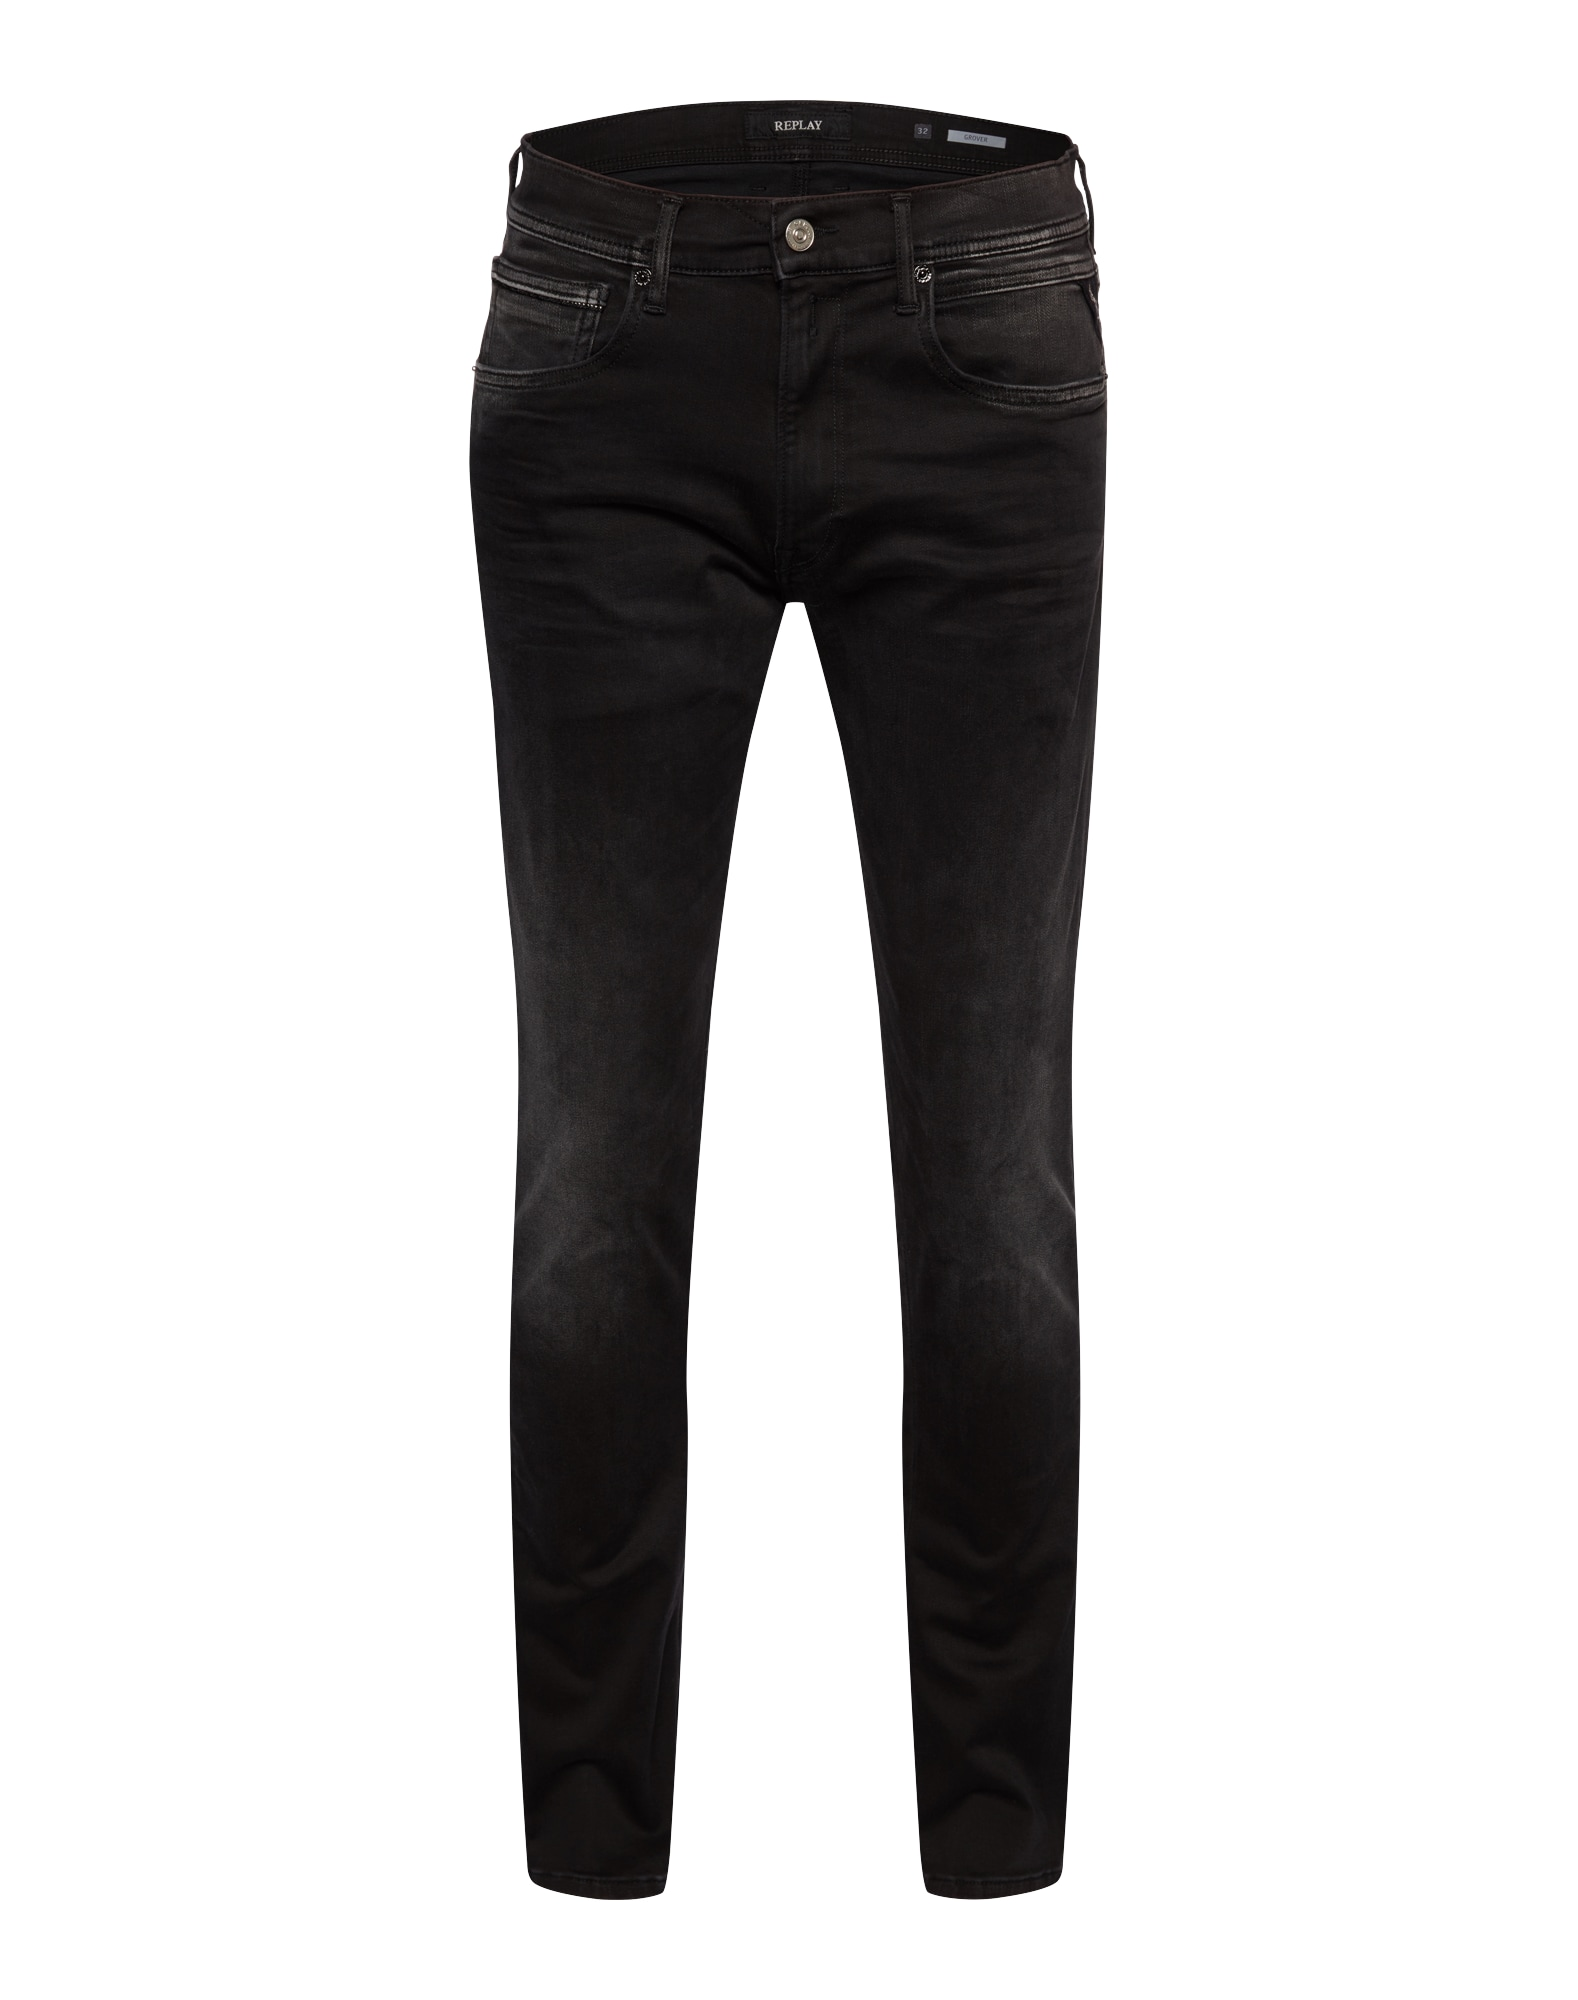 REPLAY Heren Jeans GROVER black denim